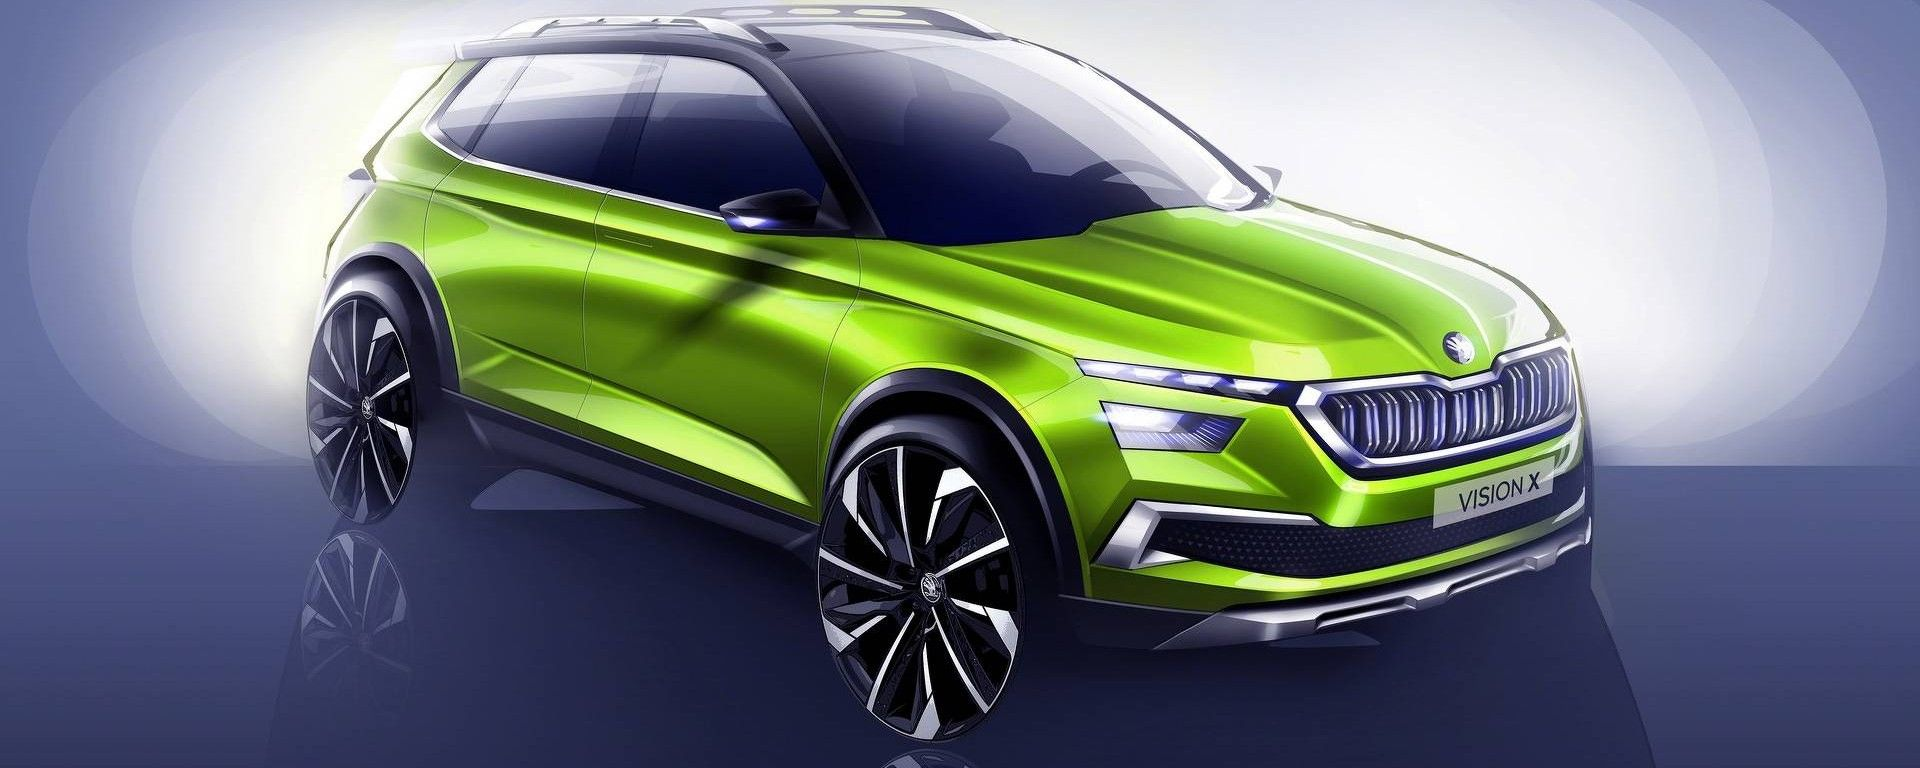 Skoda Vision X Concept: debutterà al Salone di Ginevra 2018